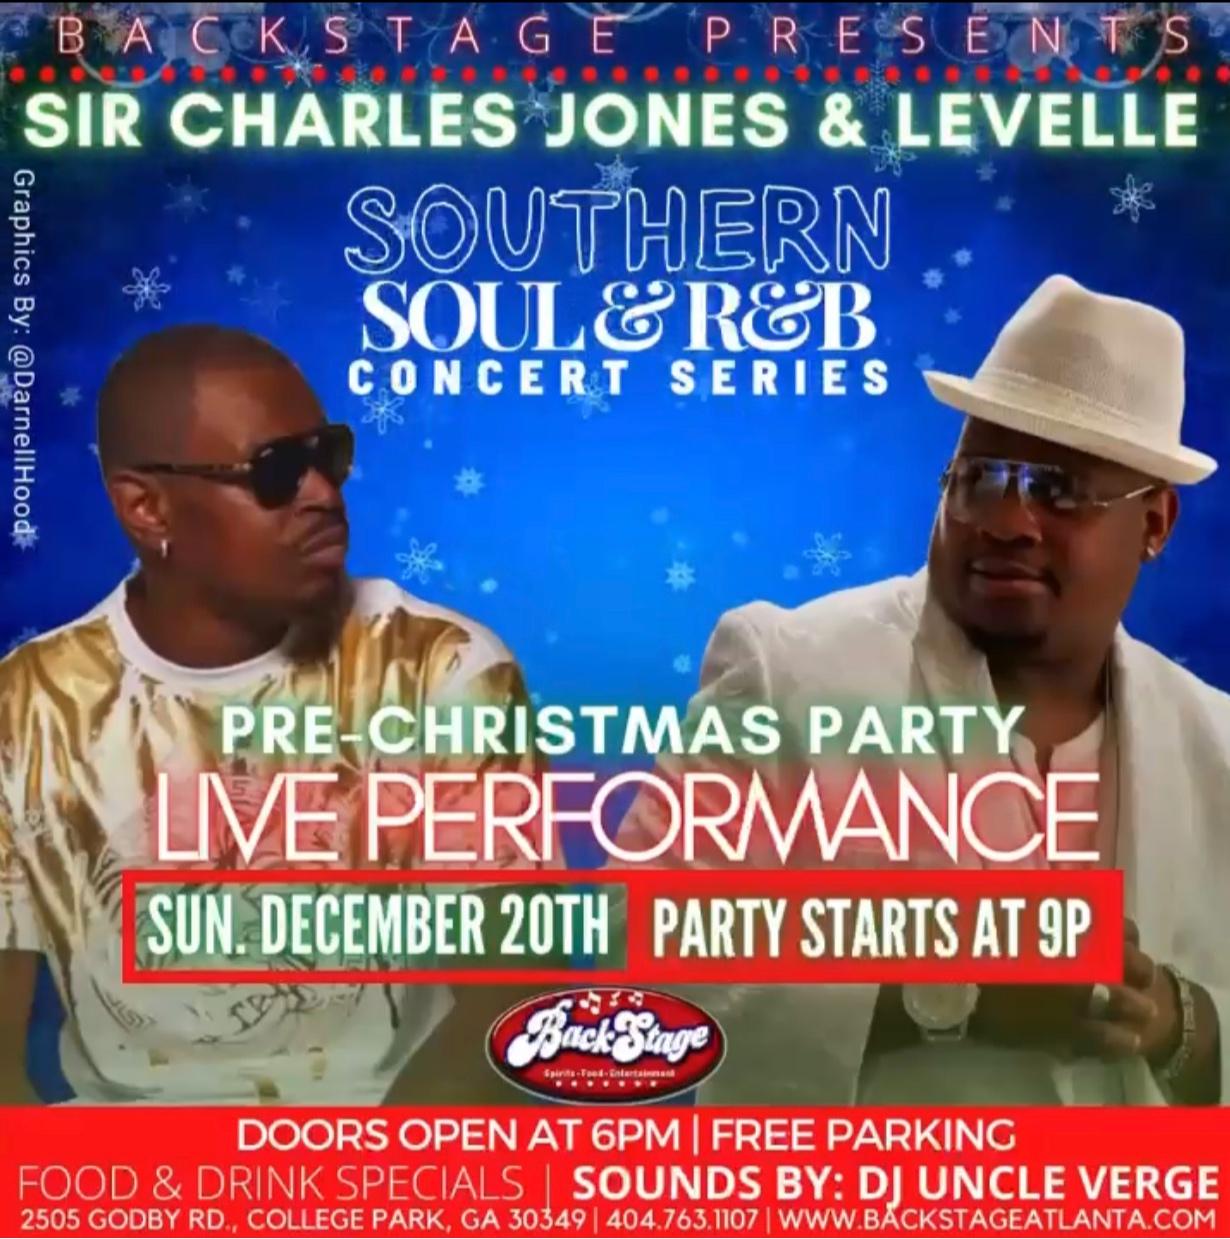 Southern Soul & R&B Concert Series | Sir Charles Jones & Levelle